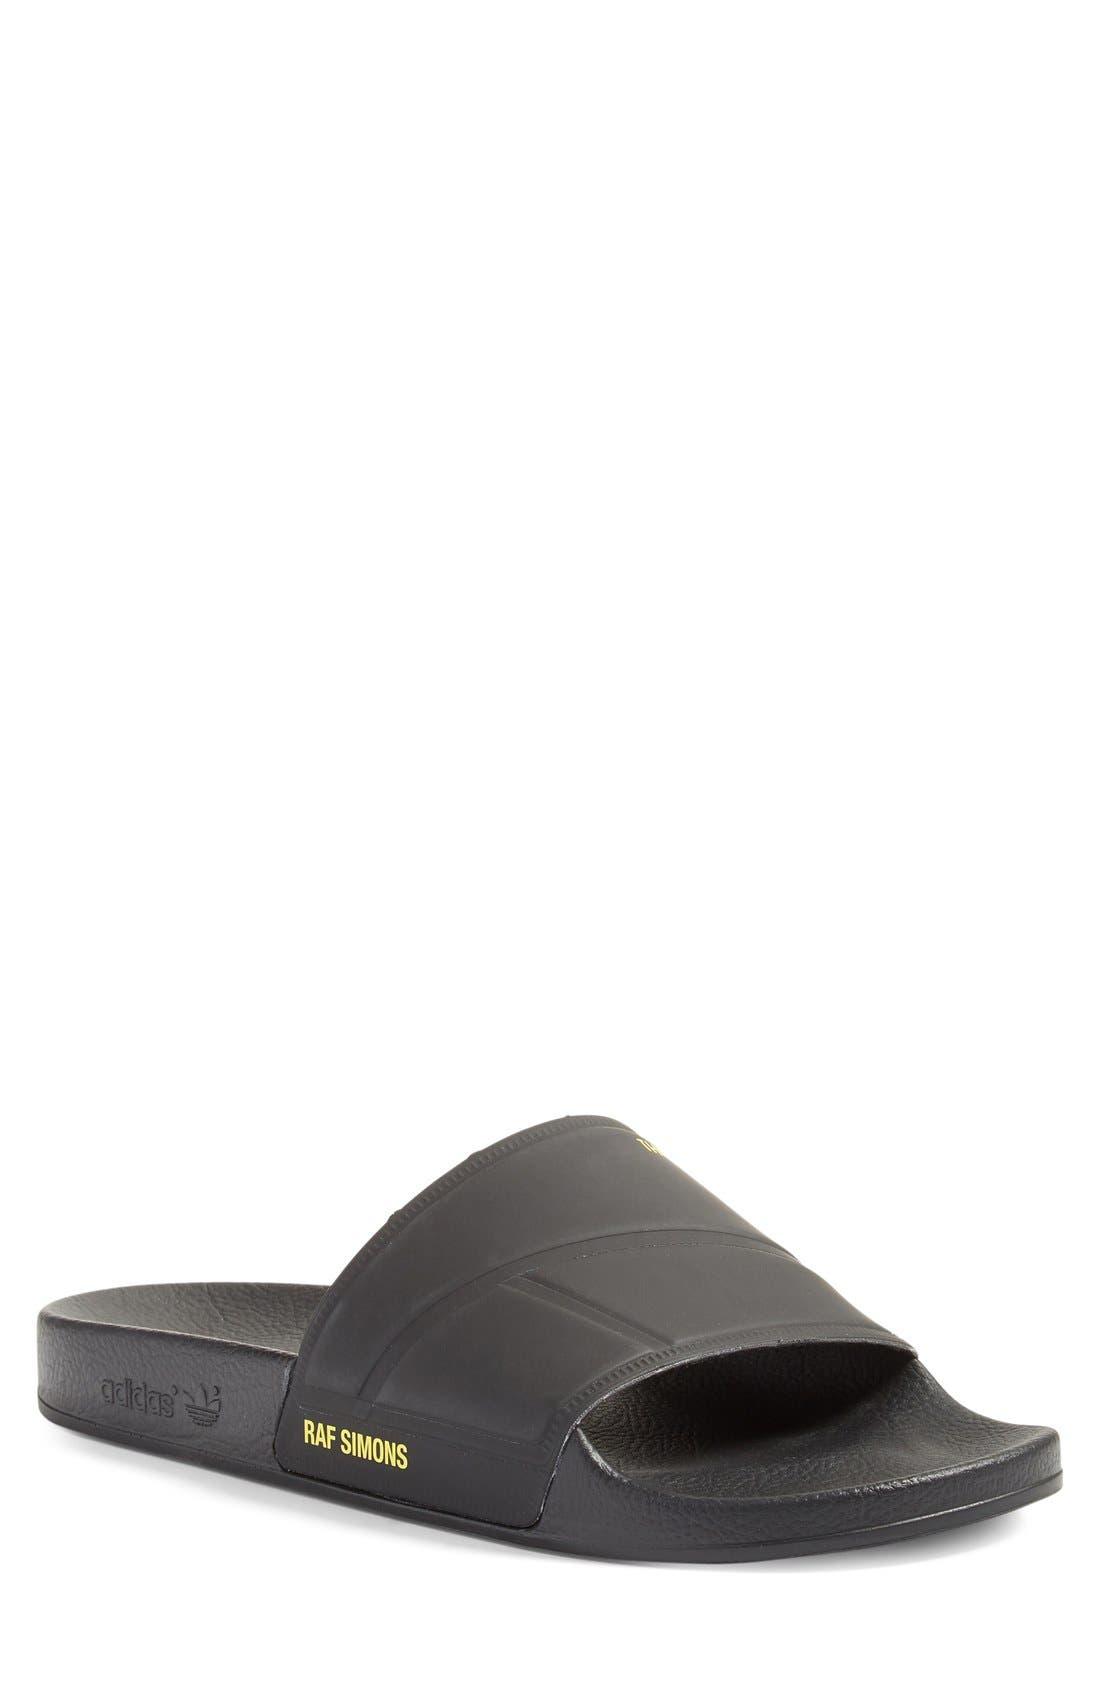 adidas by Raf Simons Bunny Adilette Slide Sandal,                         Main,                         color, 001